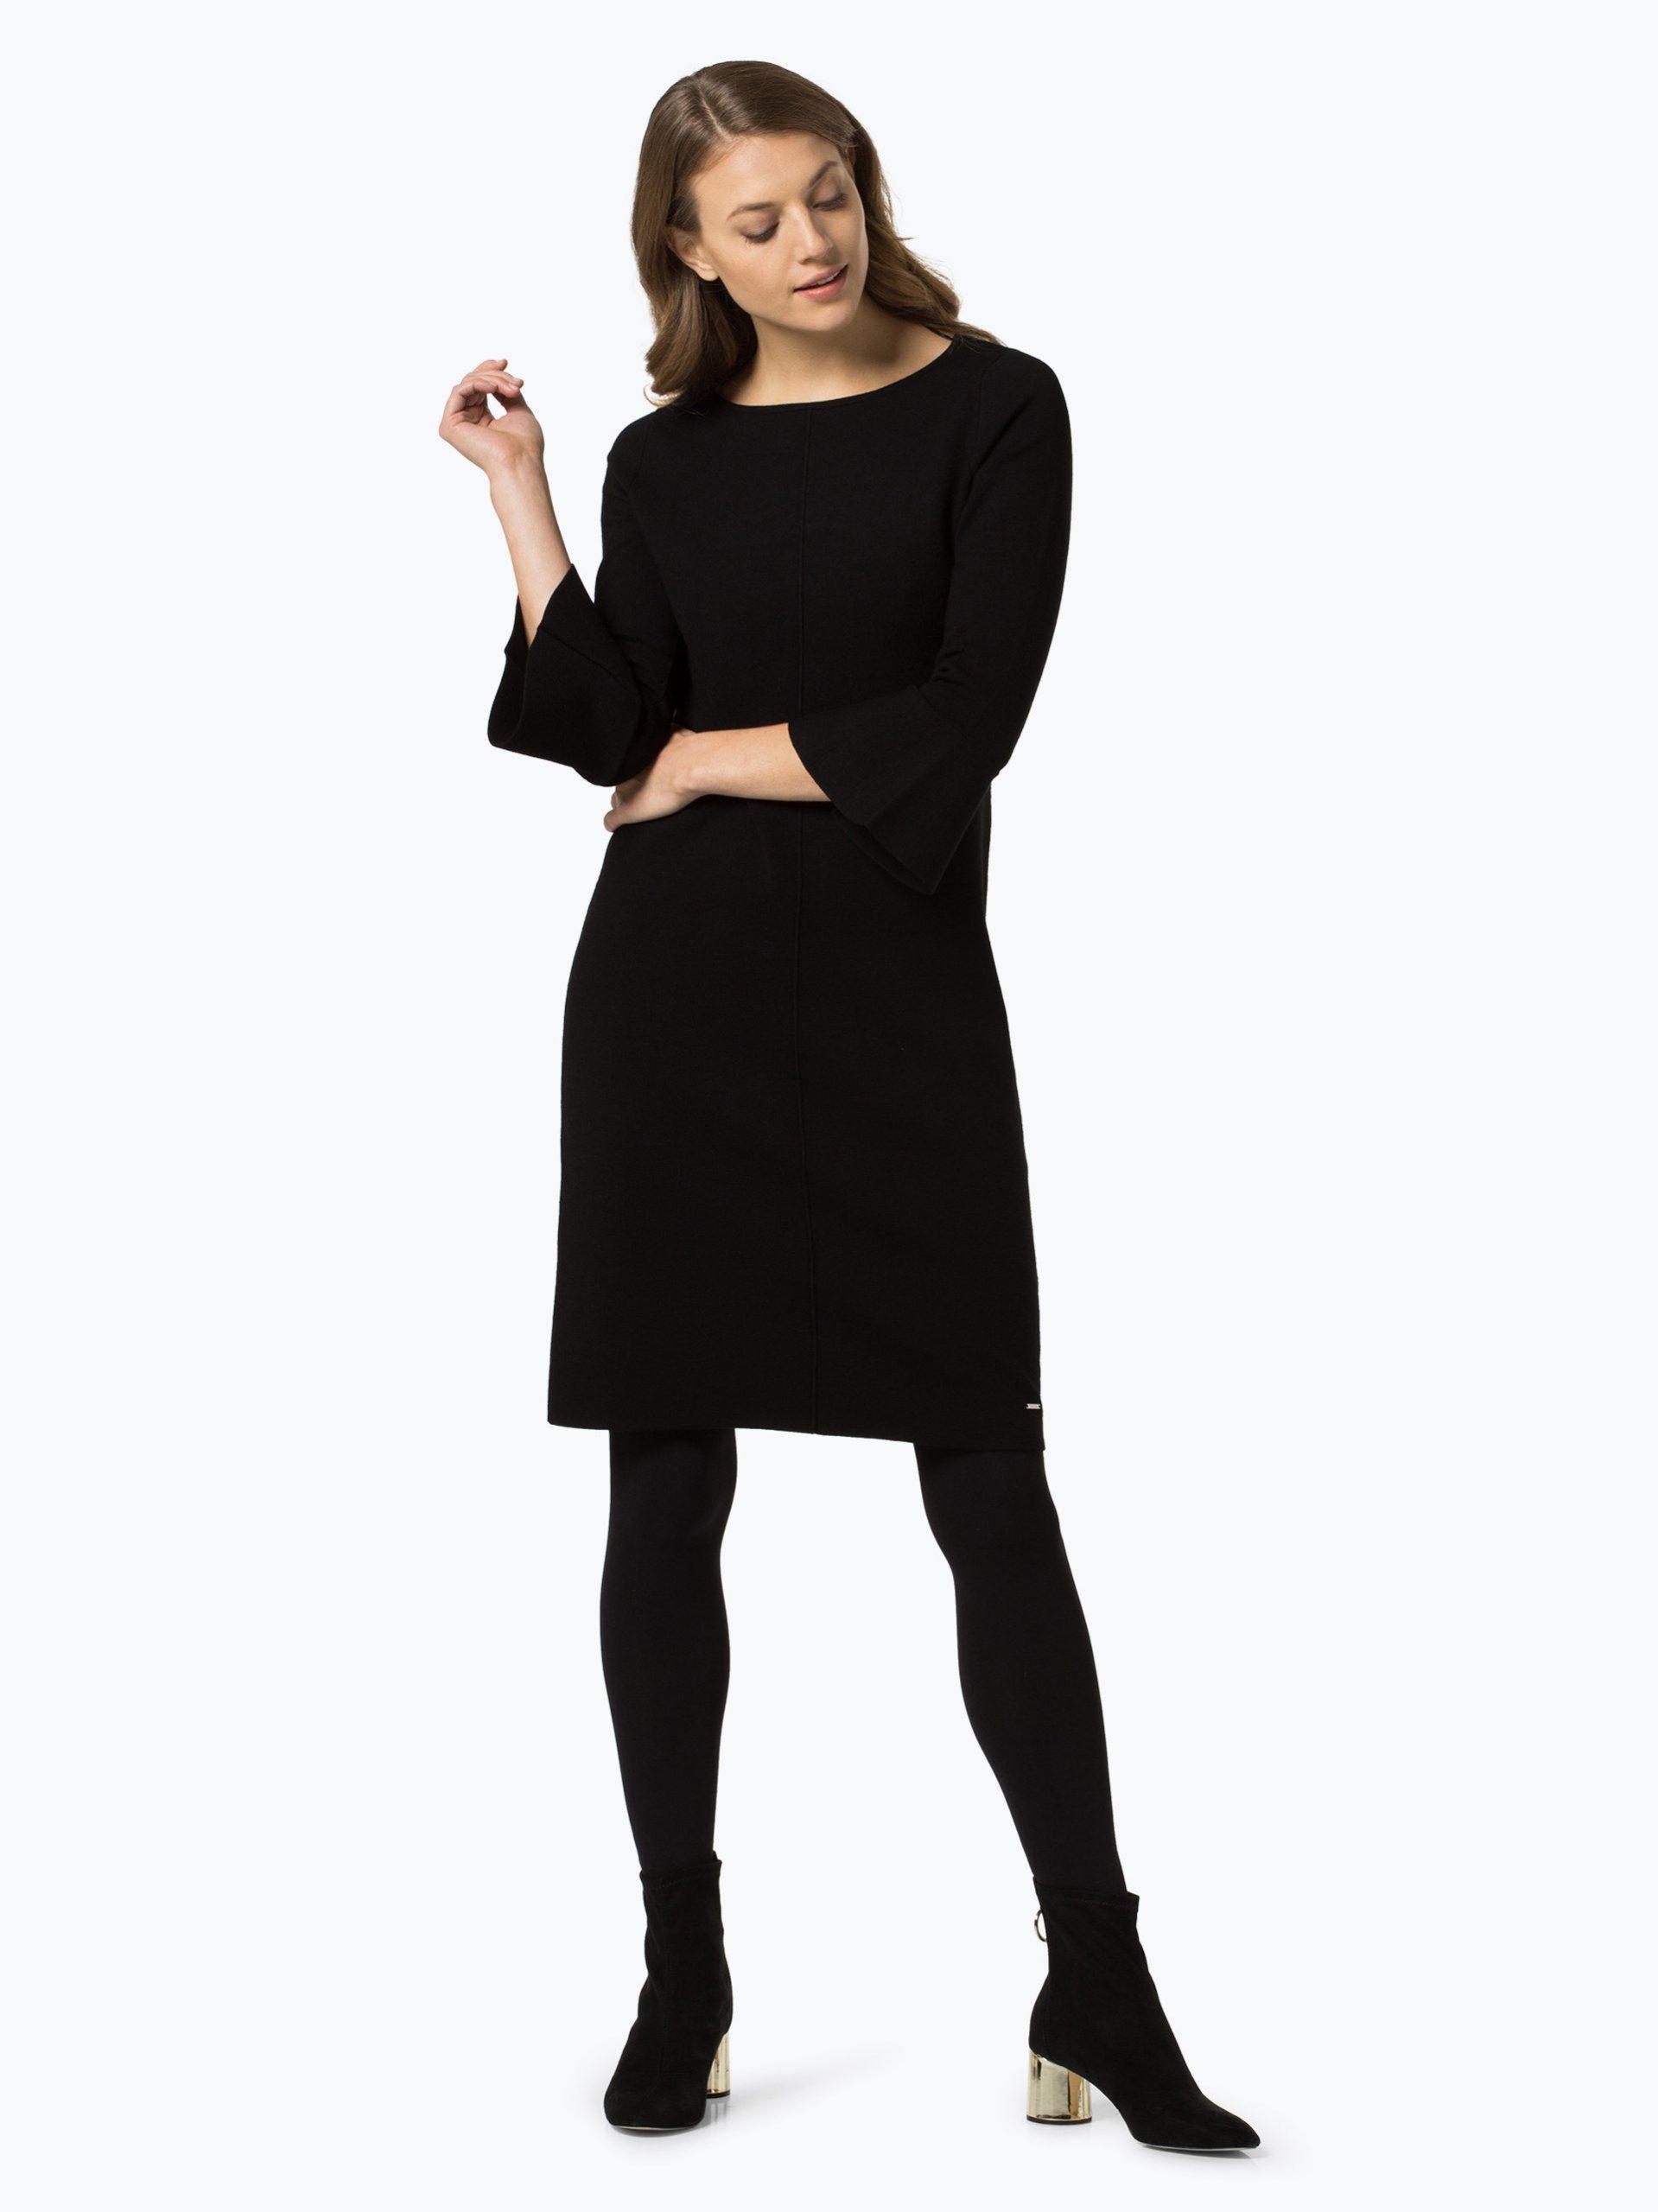 Taifun Damen Kleid Online Kaufen  Peekundcloppenburgde